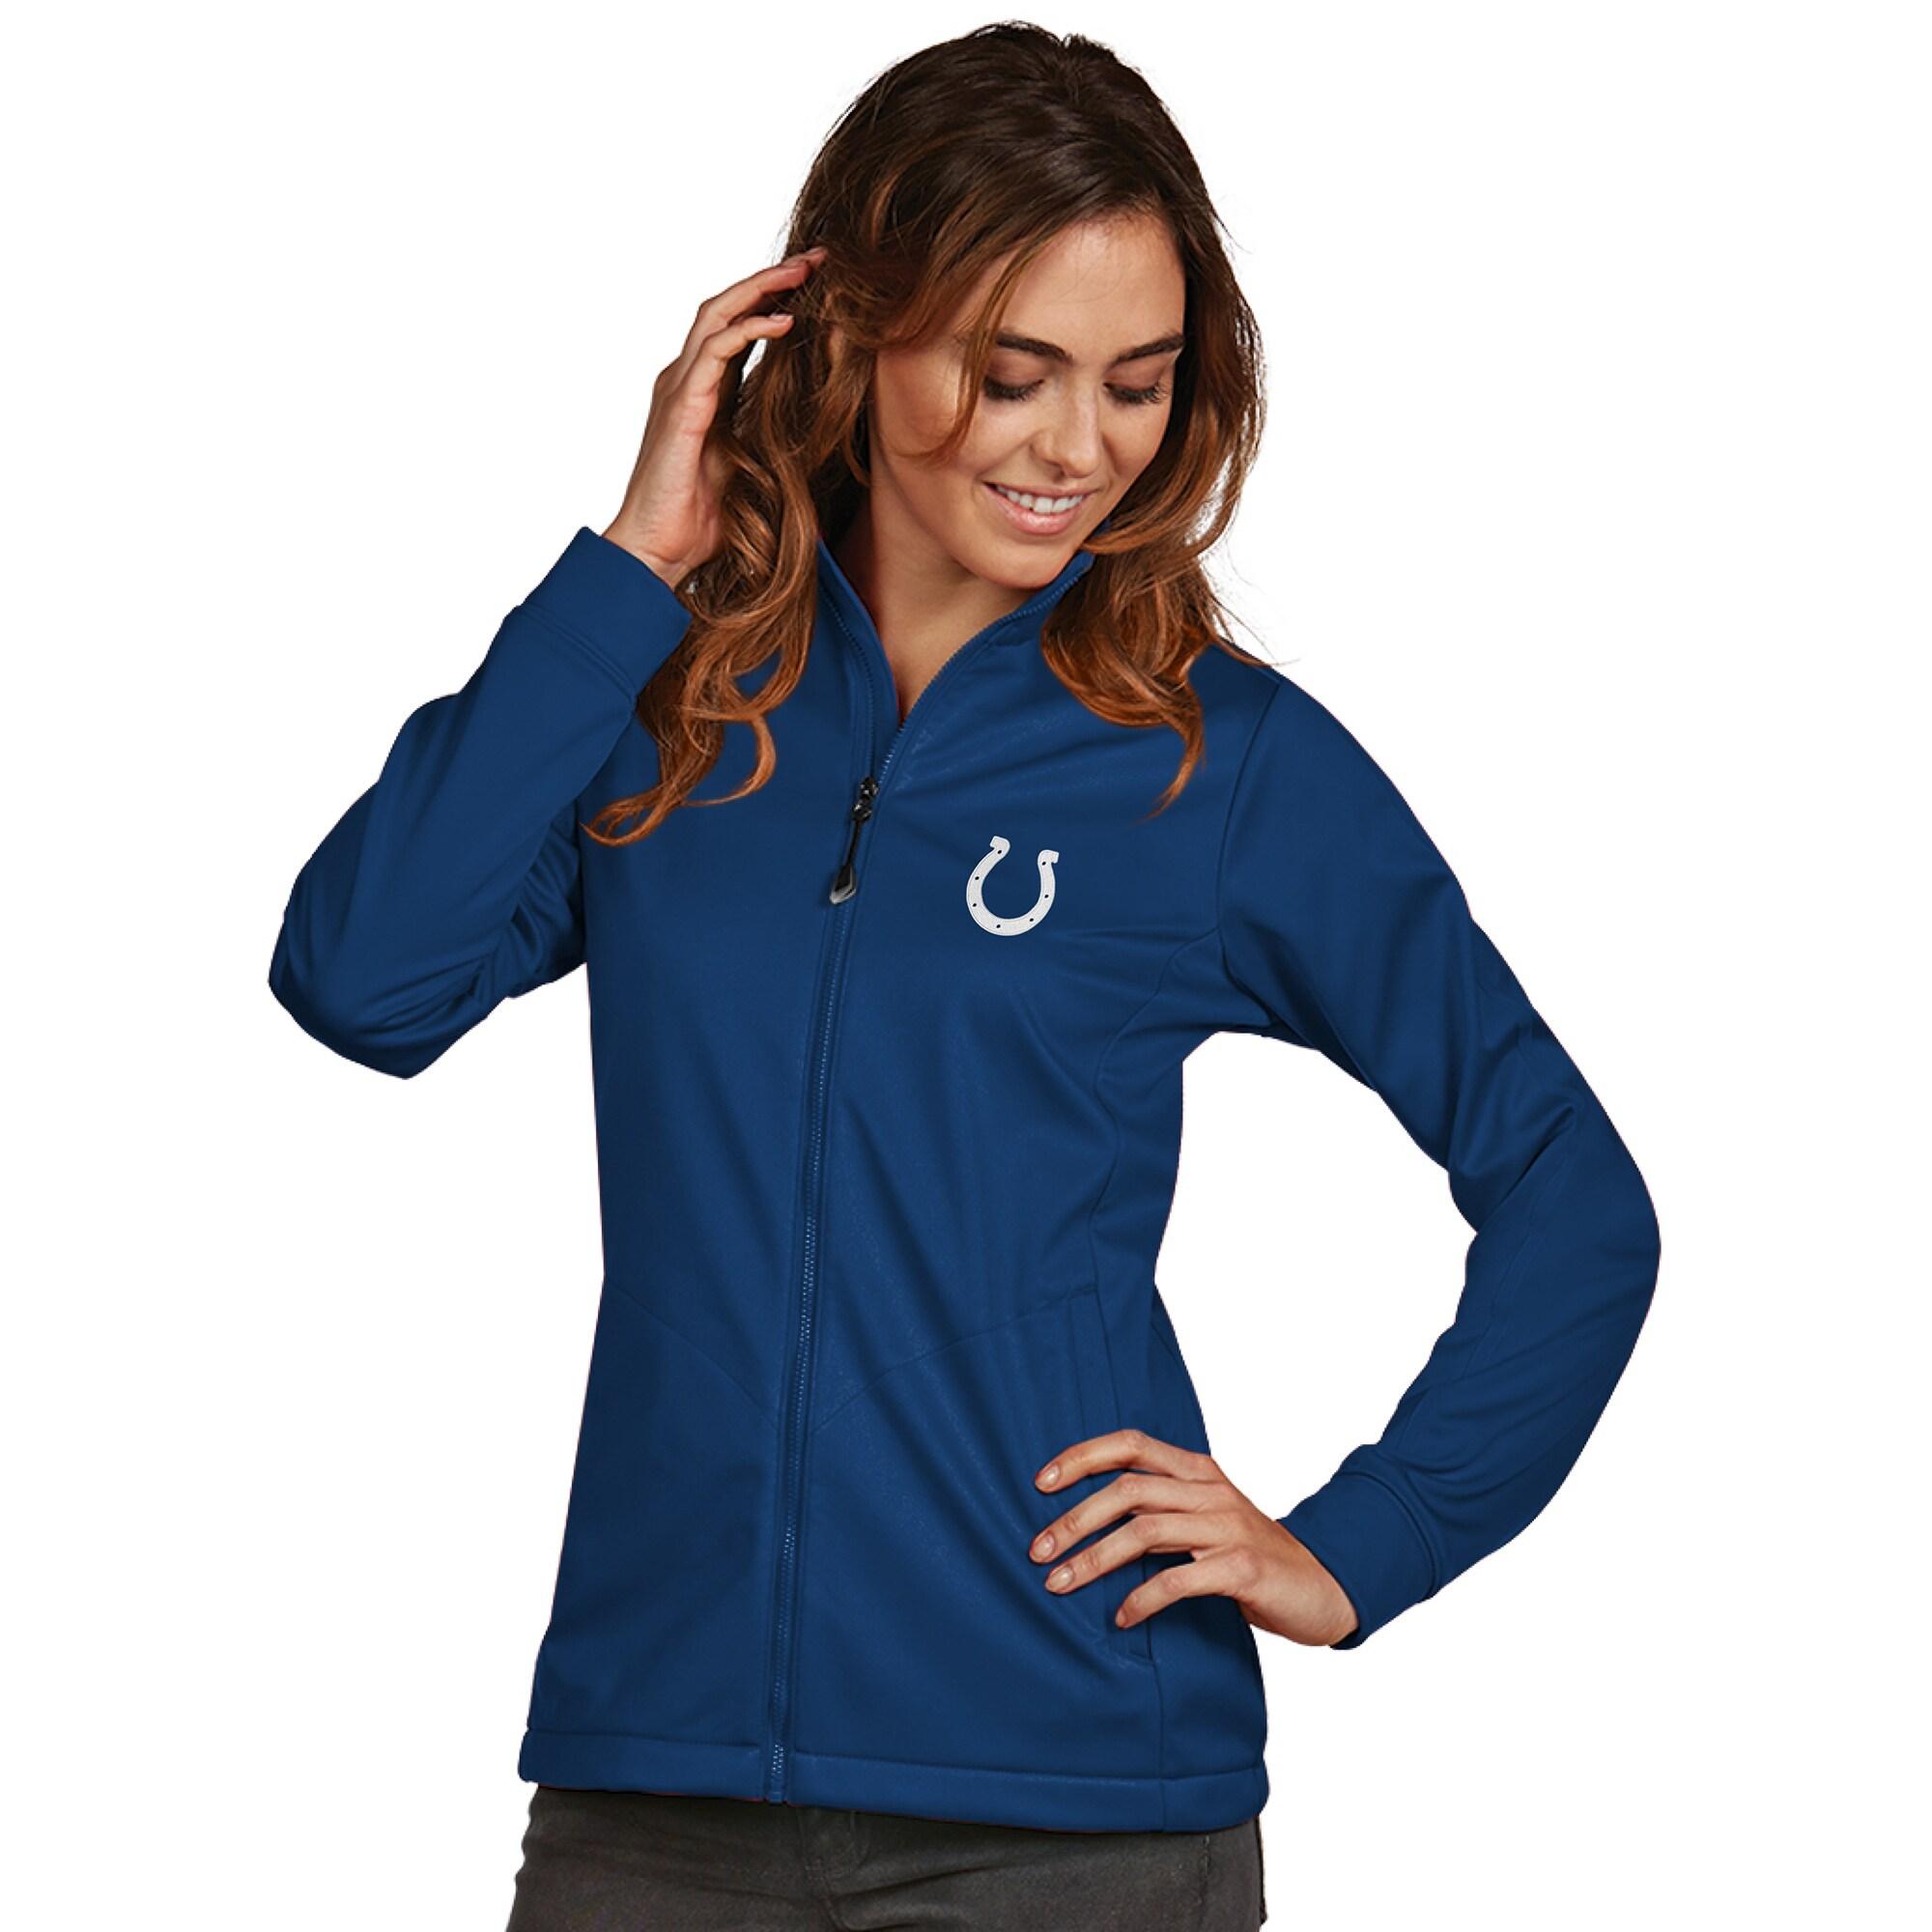 Indianapolis Colts Women's Antigua Full-Zip Golf Jacket - Royal